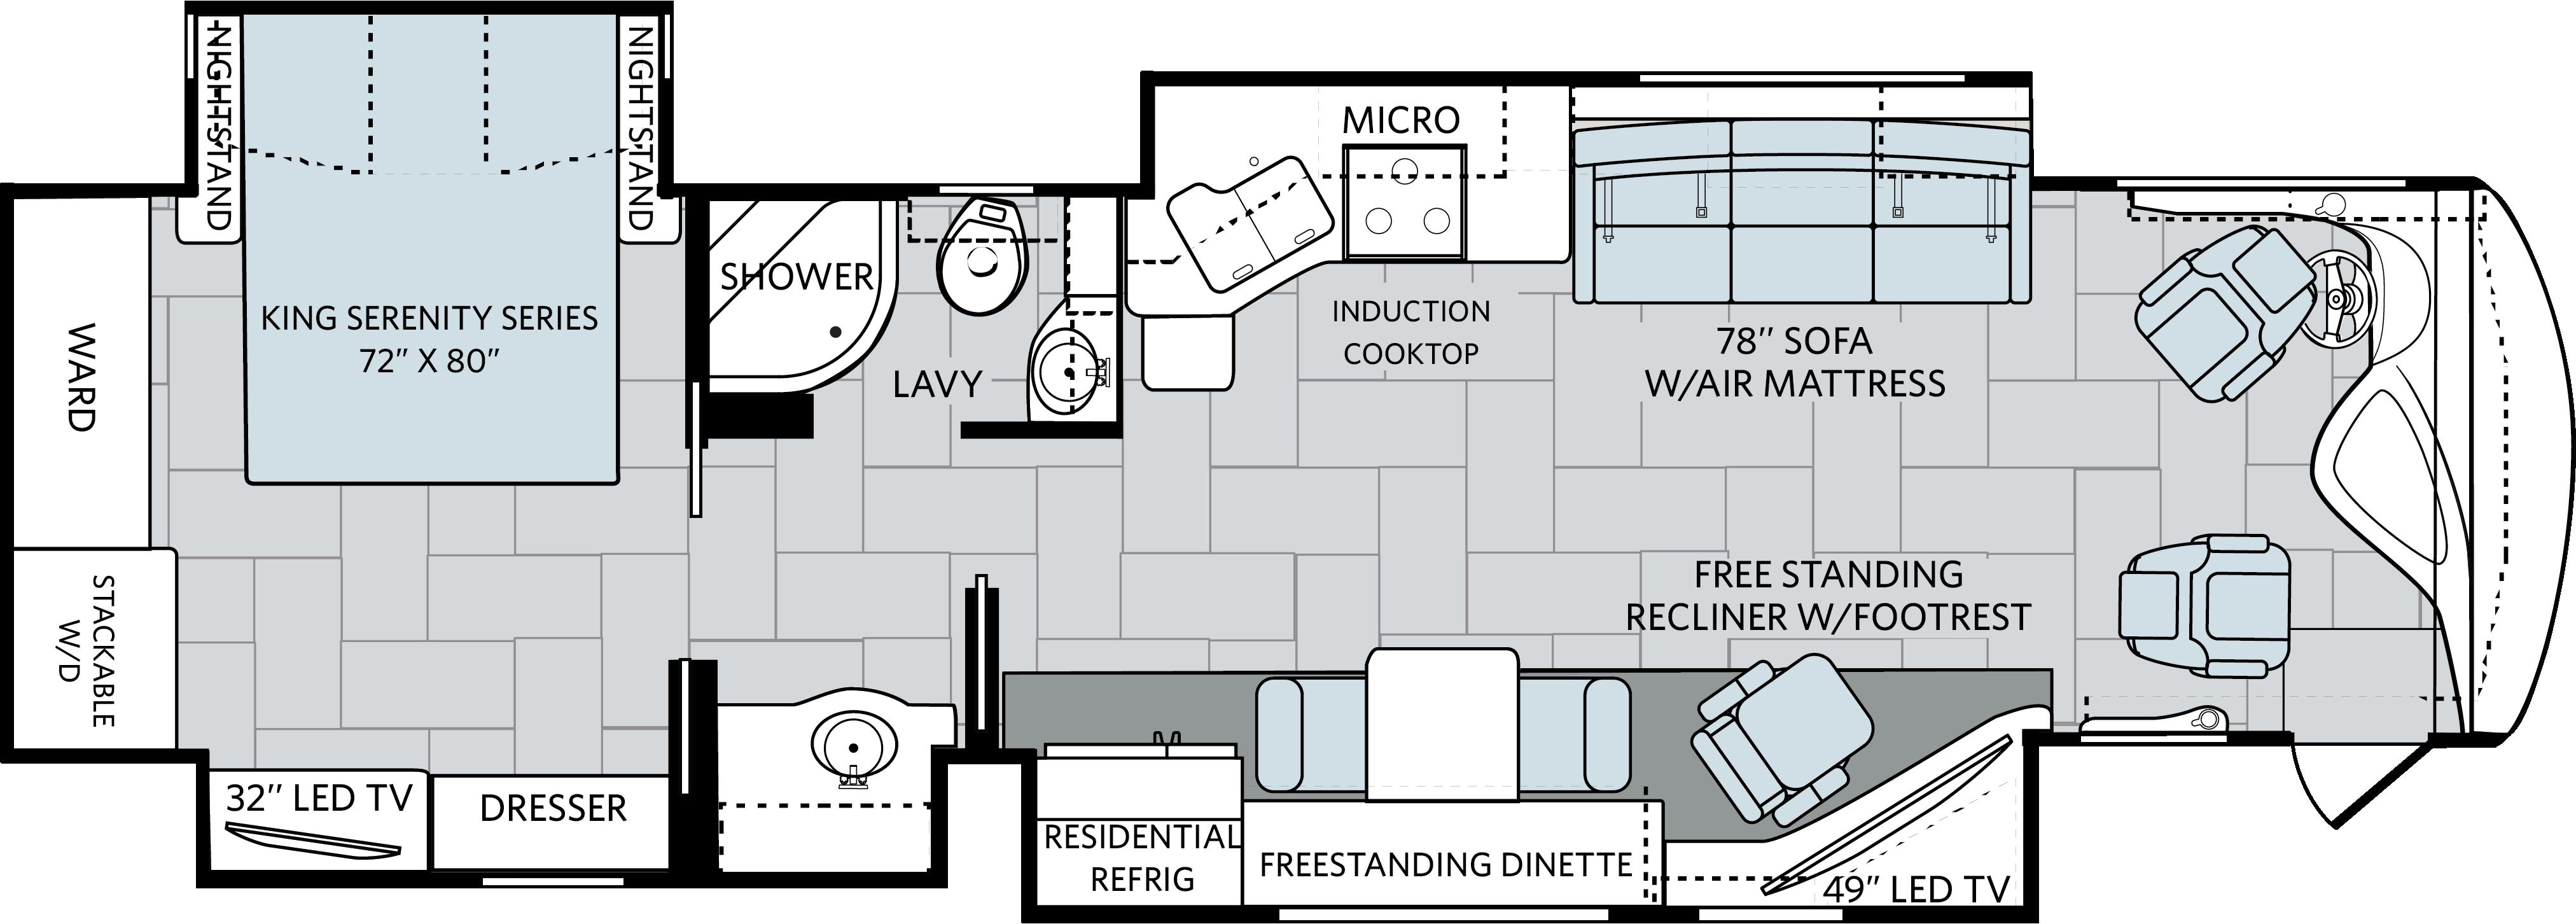 Rv Living Holiday Rambler Navigator Class A Diesel Motorhomes Induction Heating Vacuum Tube Schematics Get Free Image Floorplan 37r